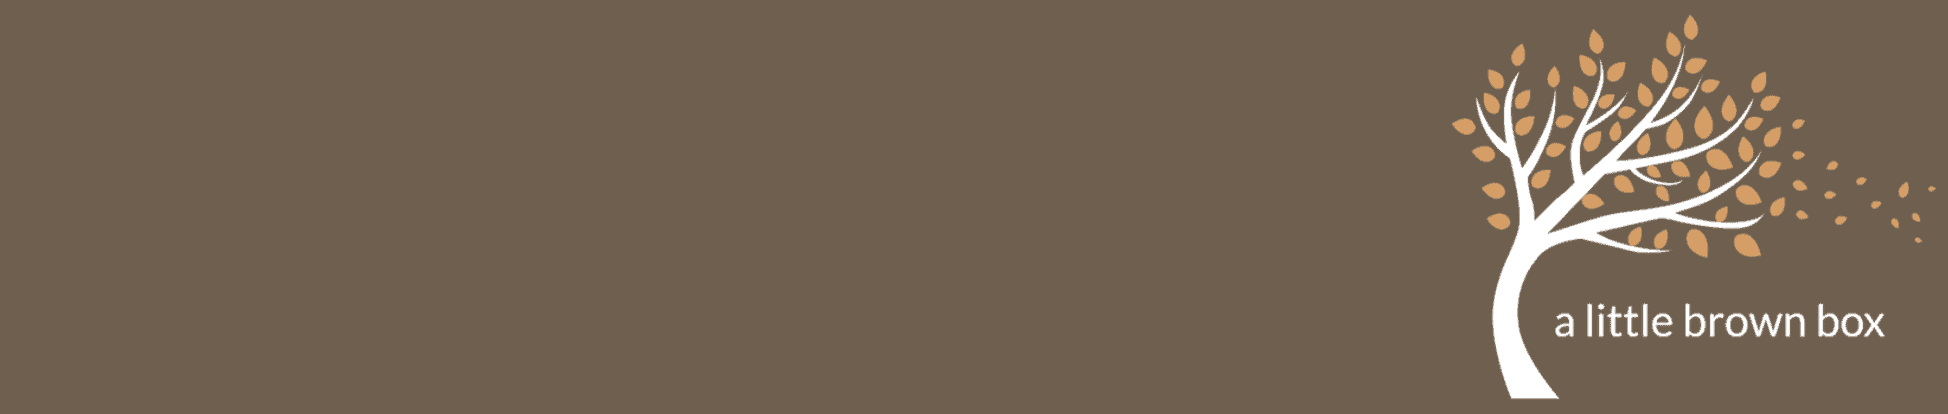 a little brown box